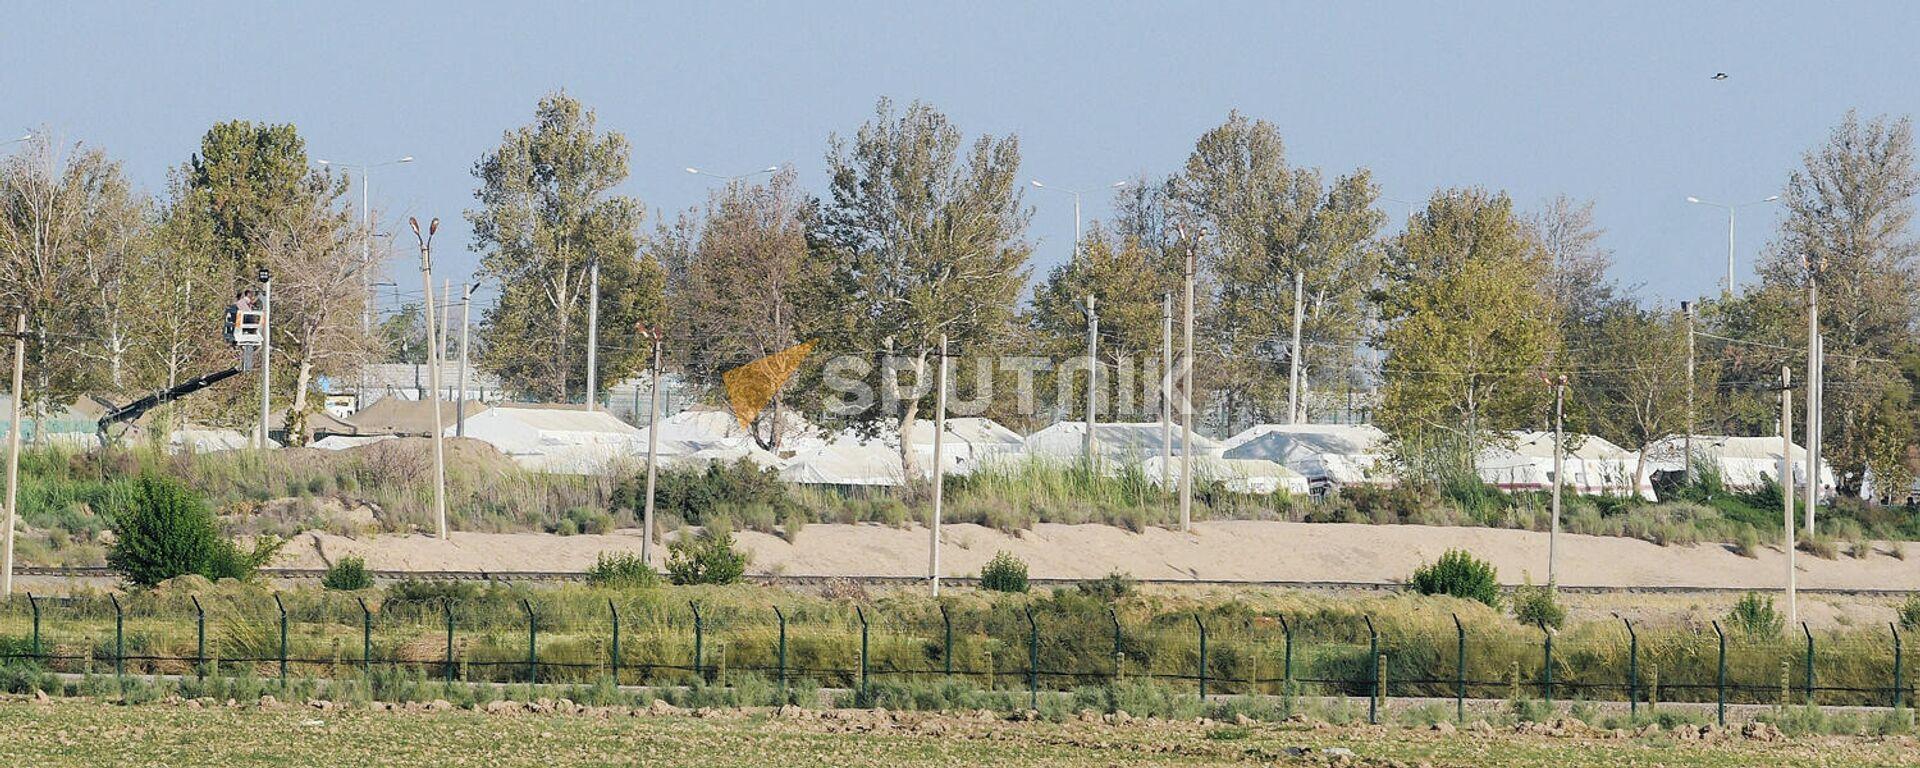 Ситуация на границе Узбекистана и Афганистана в районе города Термез - Sputnik Ўзбекистон, 1920, 18.08.2021